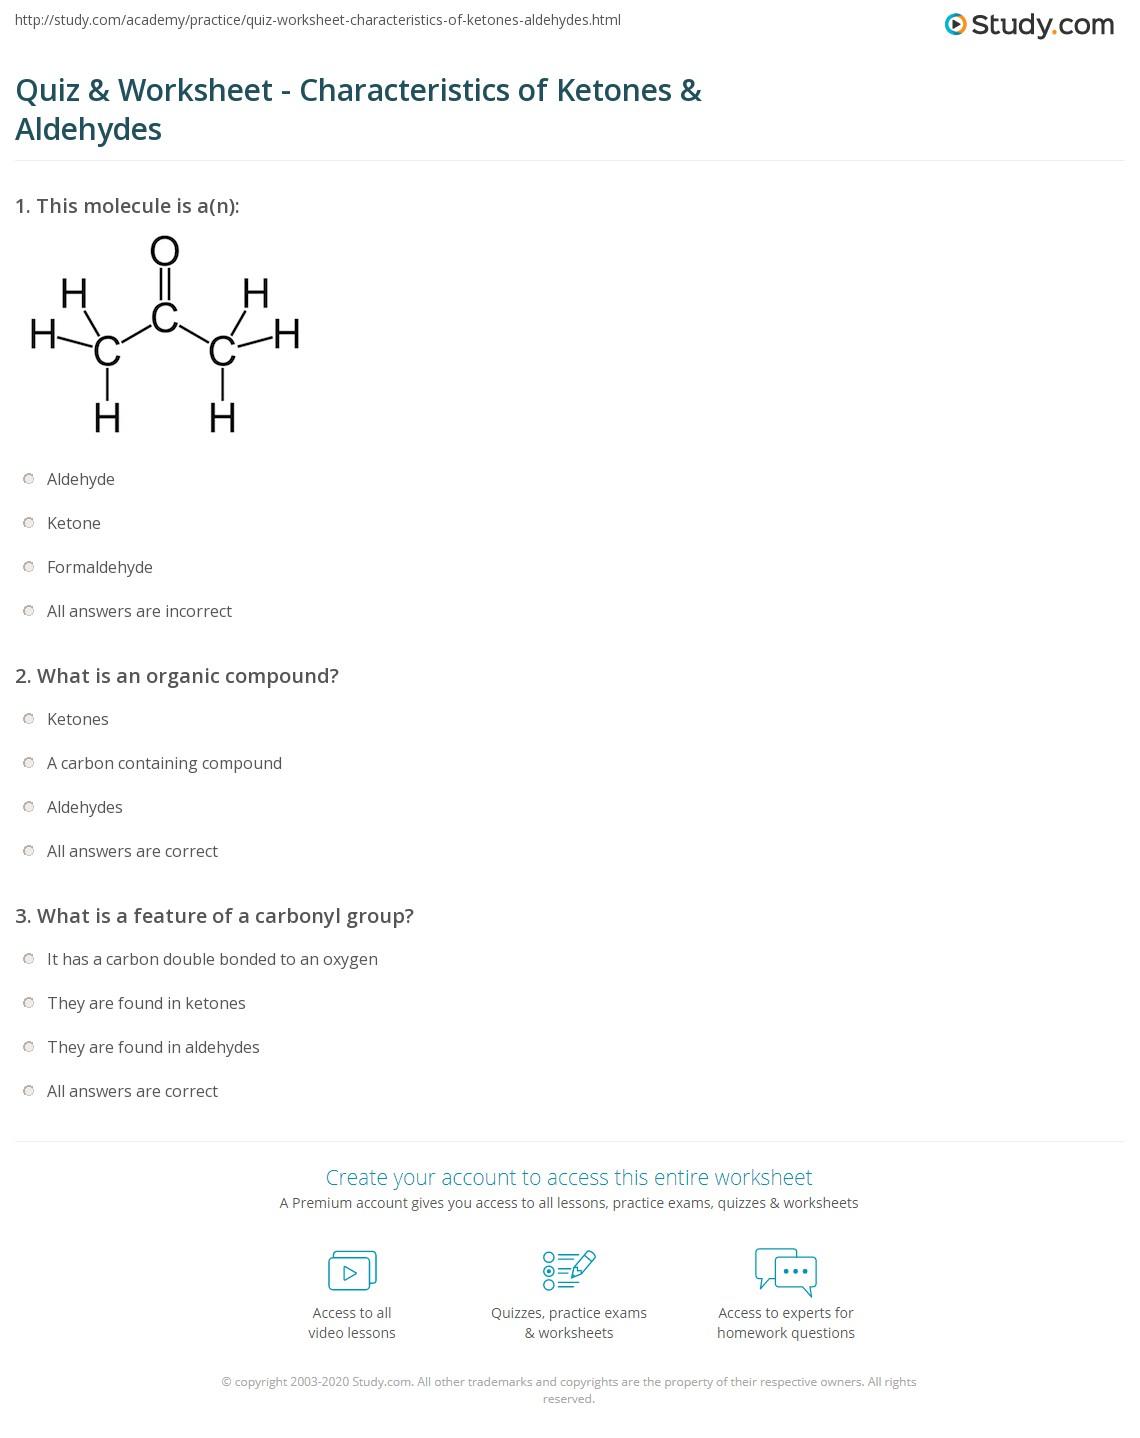 quiz worksheet characteristics of ketones aldehydes. Black Bedroom Furniture Sets. Home Design Ideas